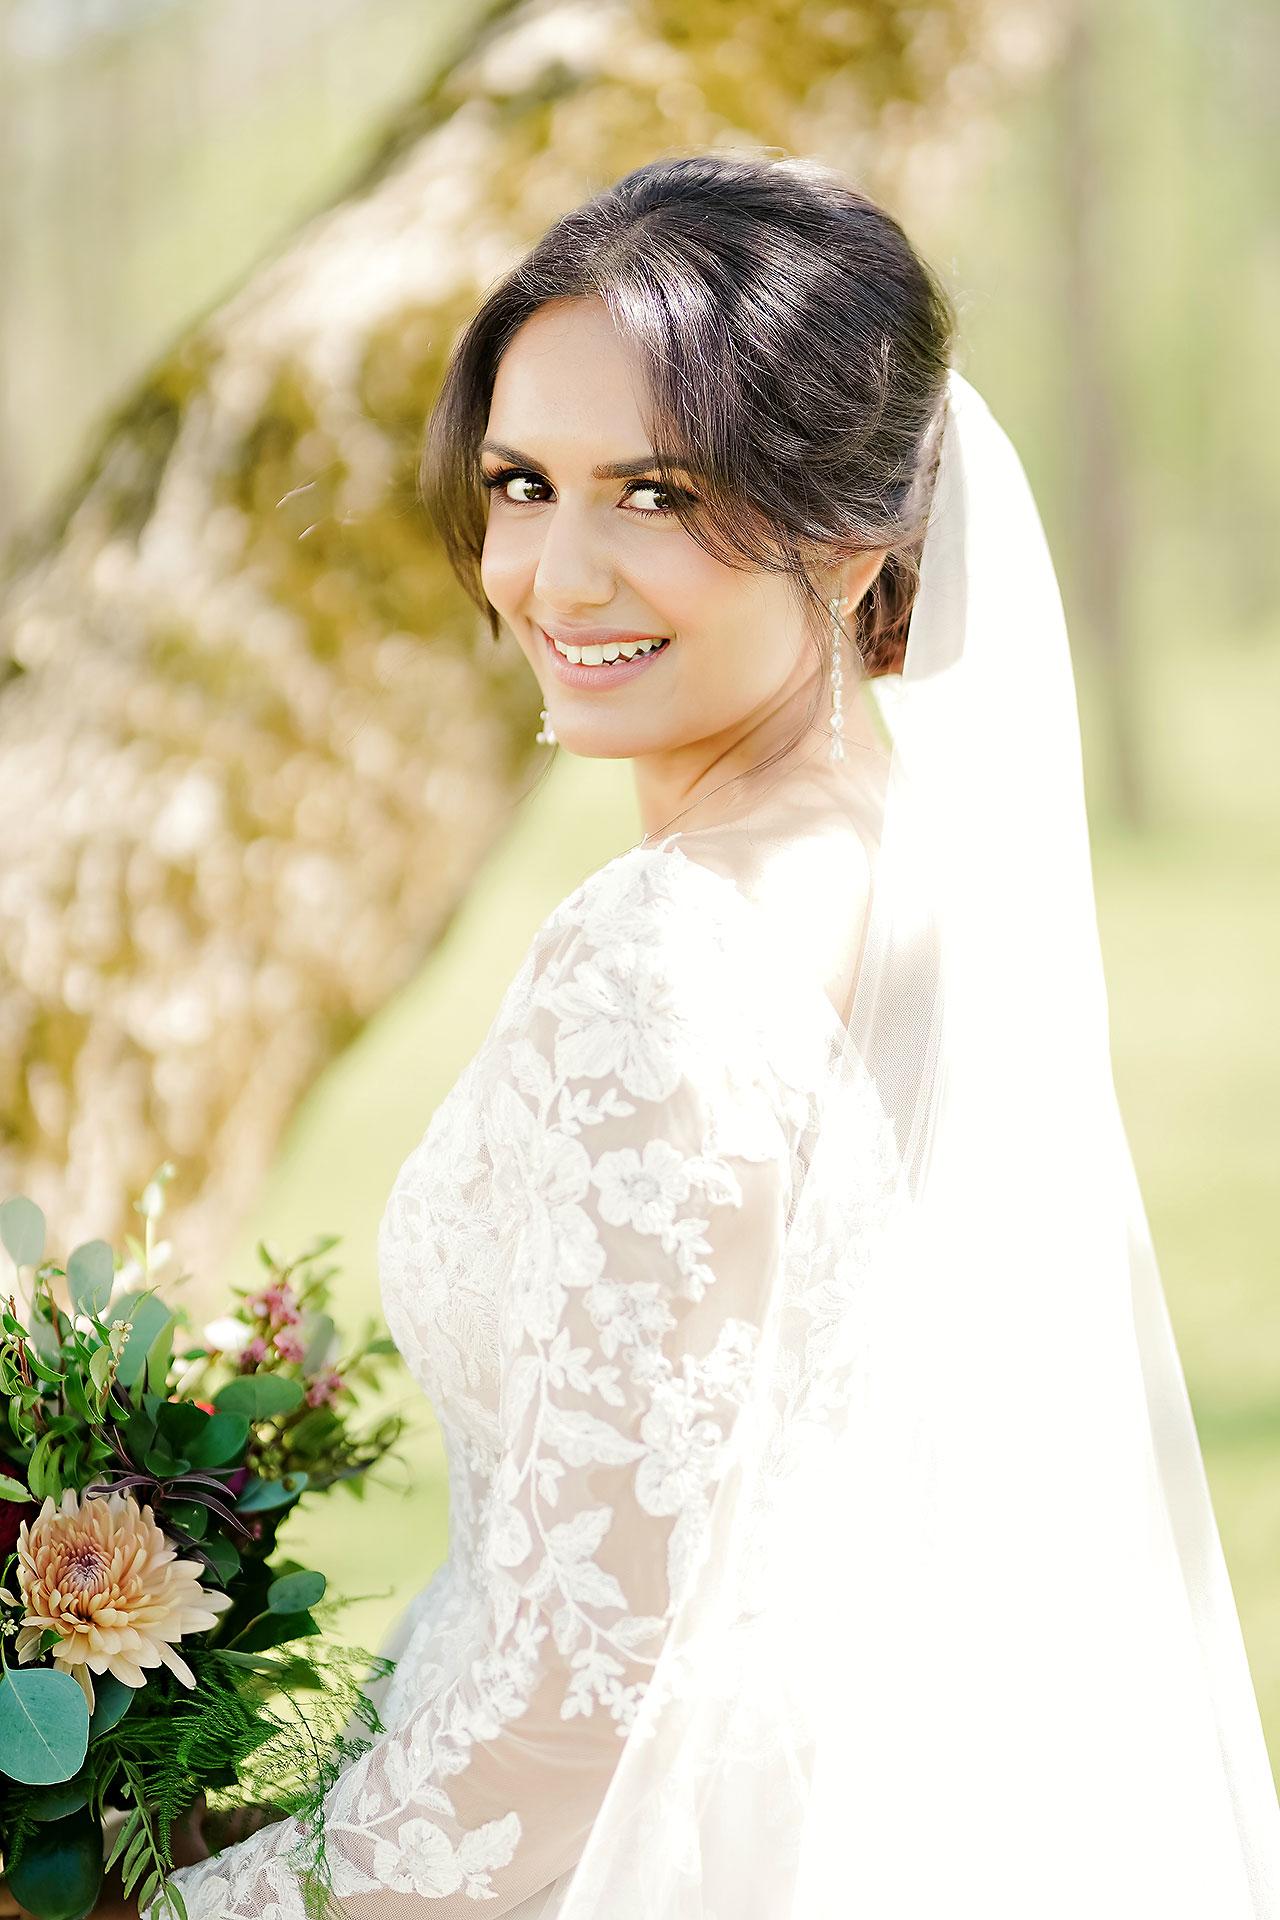 Nadia Parker Black Iris Estate Carmel Indiana Wedding May 2021 080